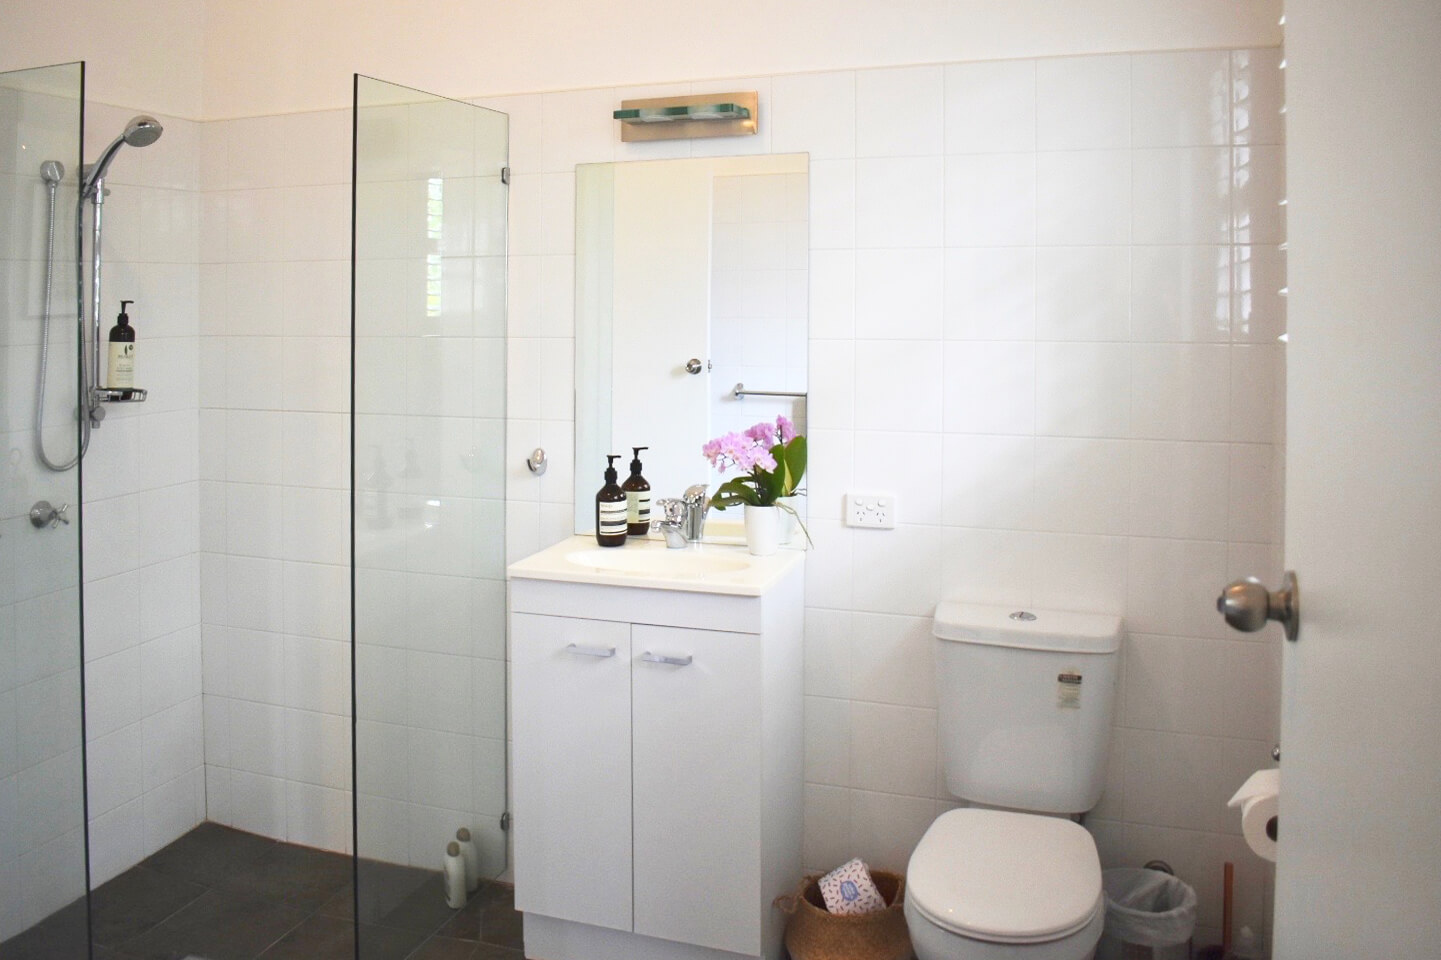 GH_Bathroom.jpg